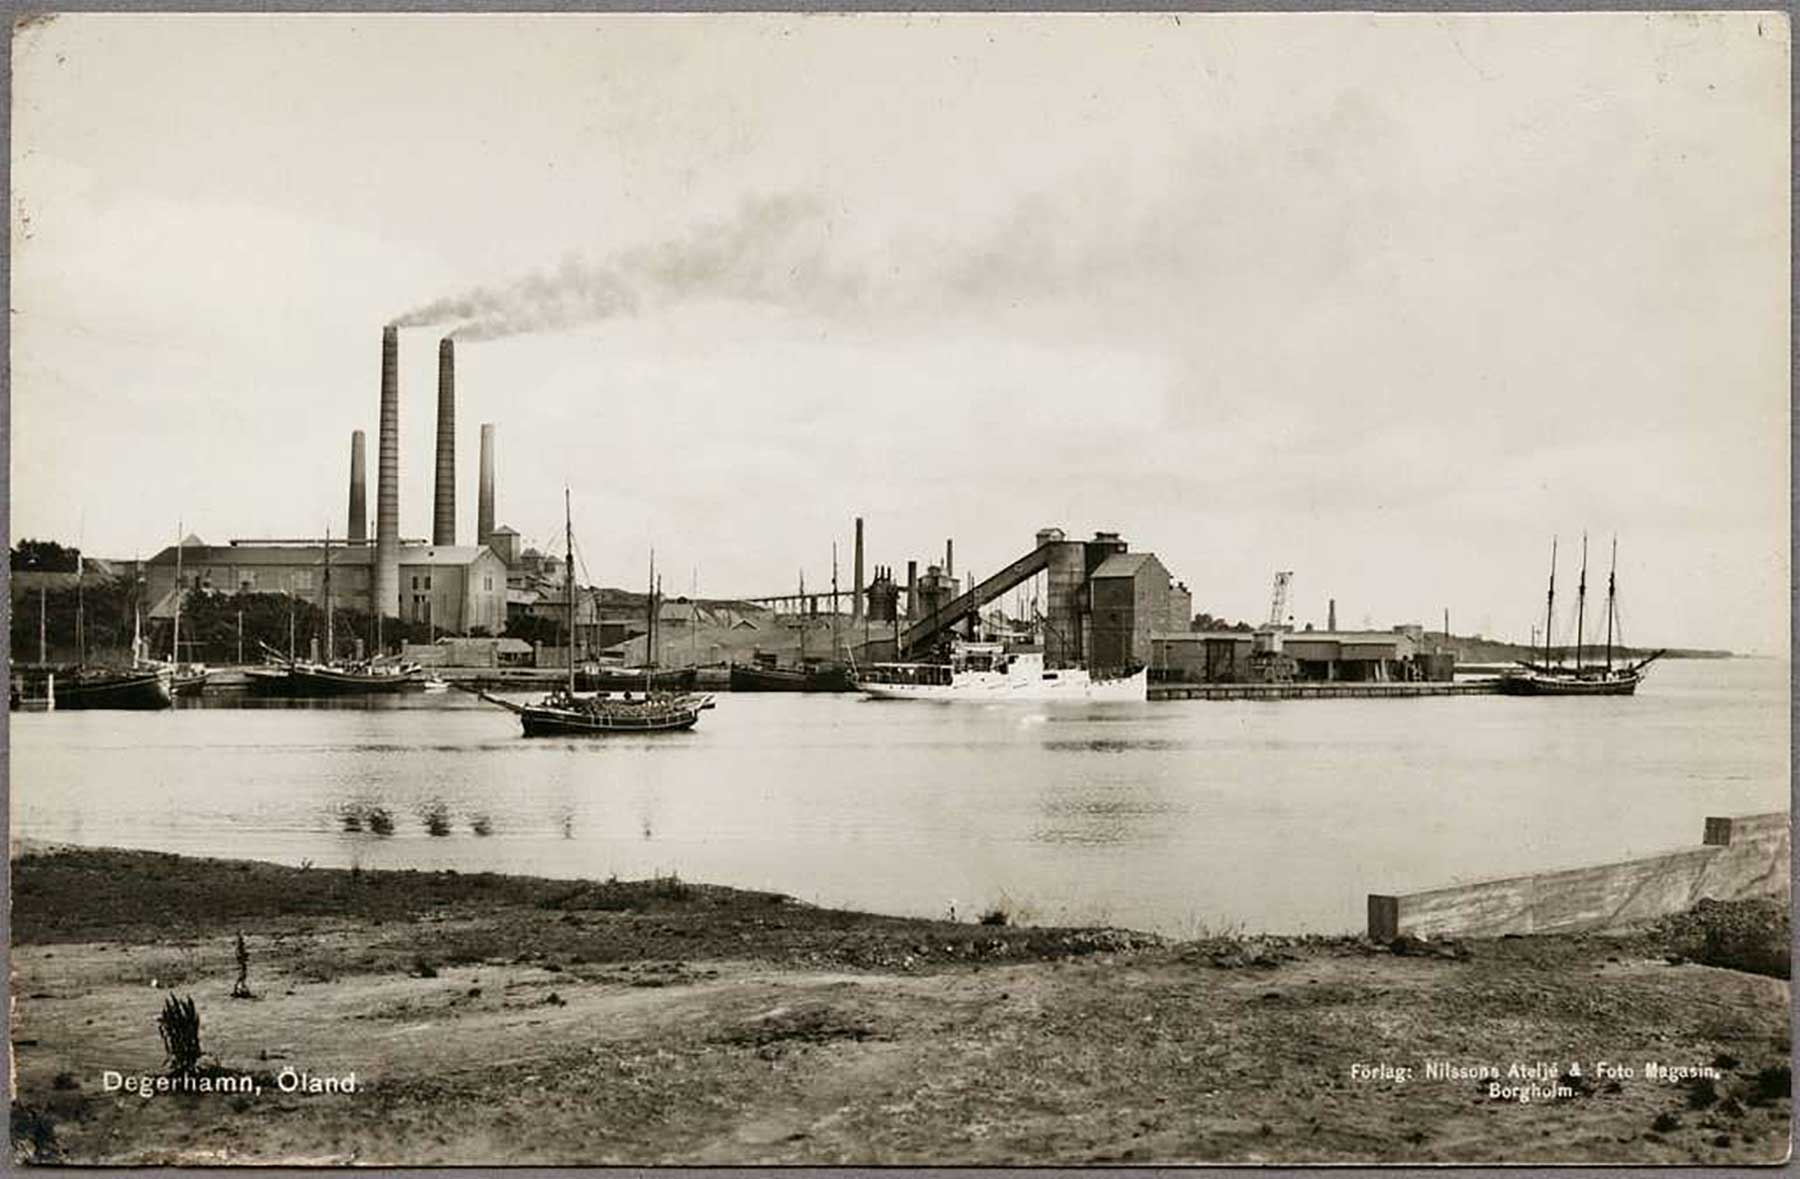 Ölands Cementfabrik in Degerport - 1950. One of the first cement factories in Sweden, Ölands Cement AB began in 1886.